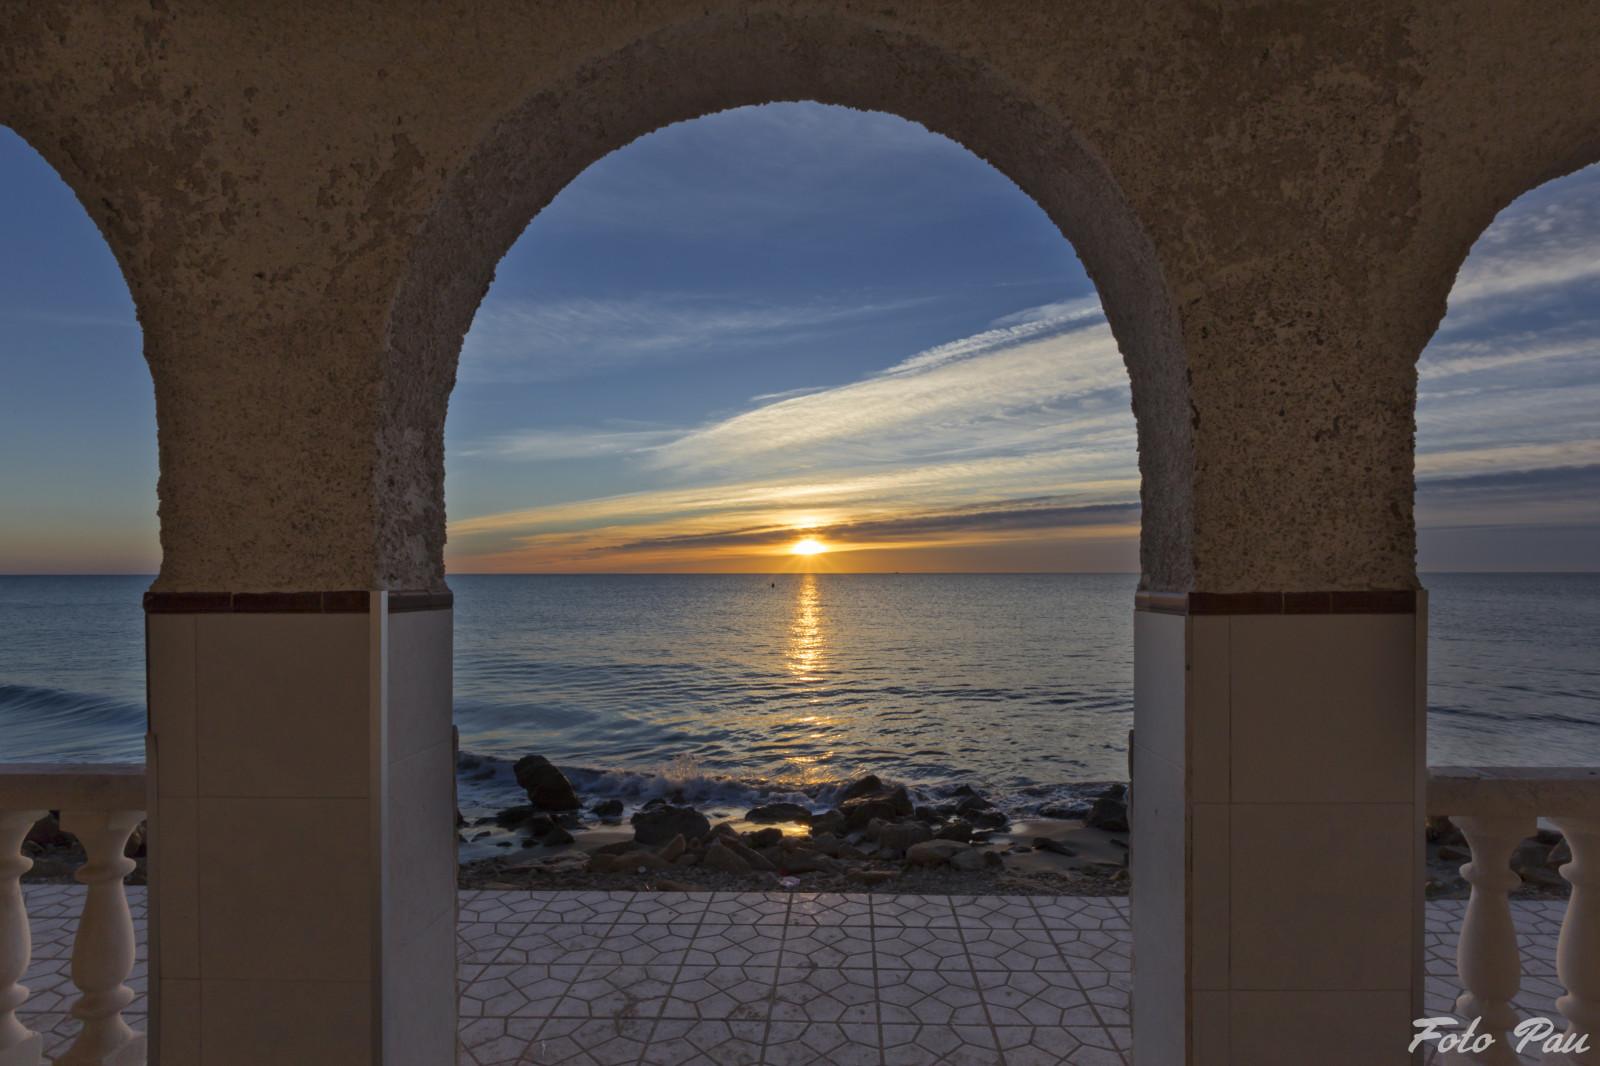 Fondos de pantalla : ventana, puesta de sol, mar, agua, edificio ...